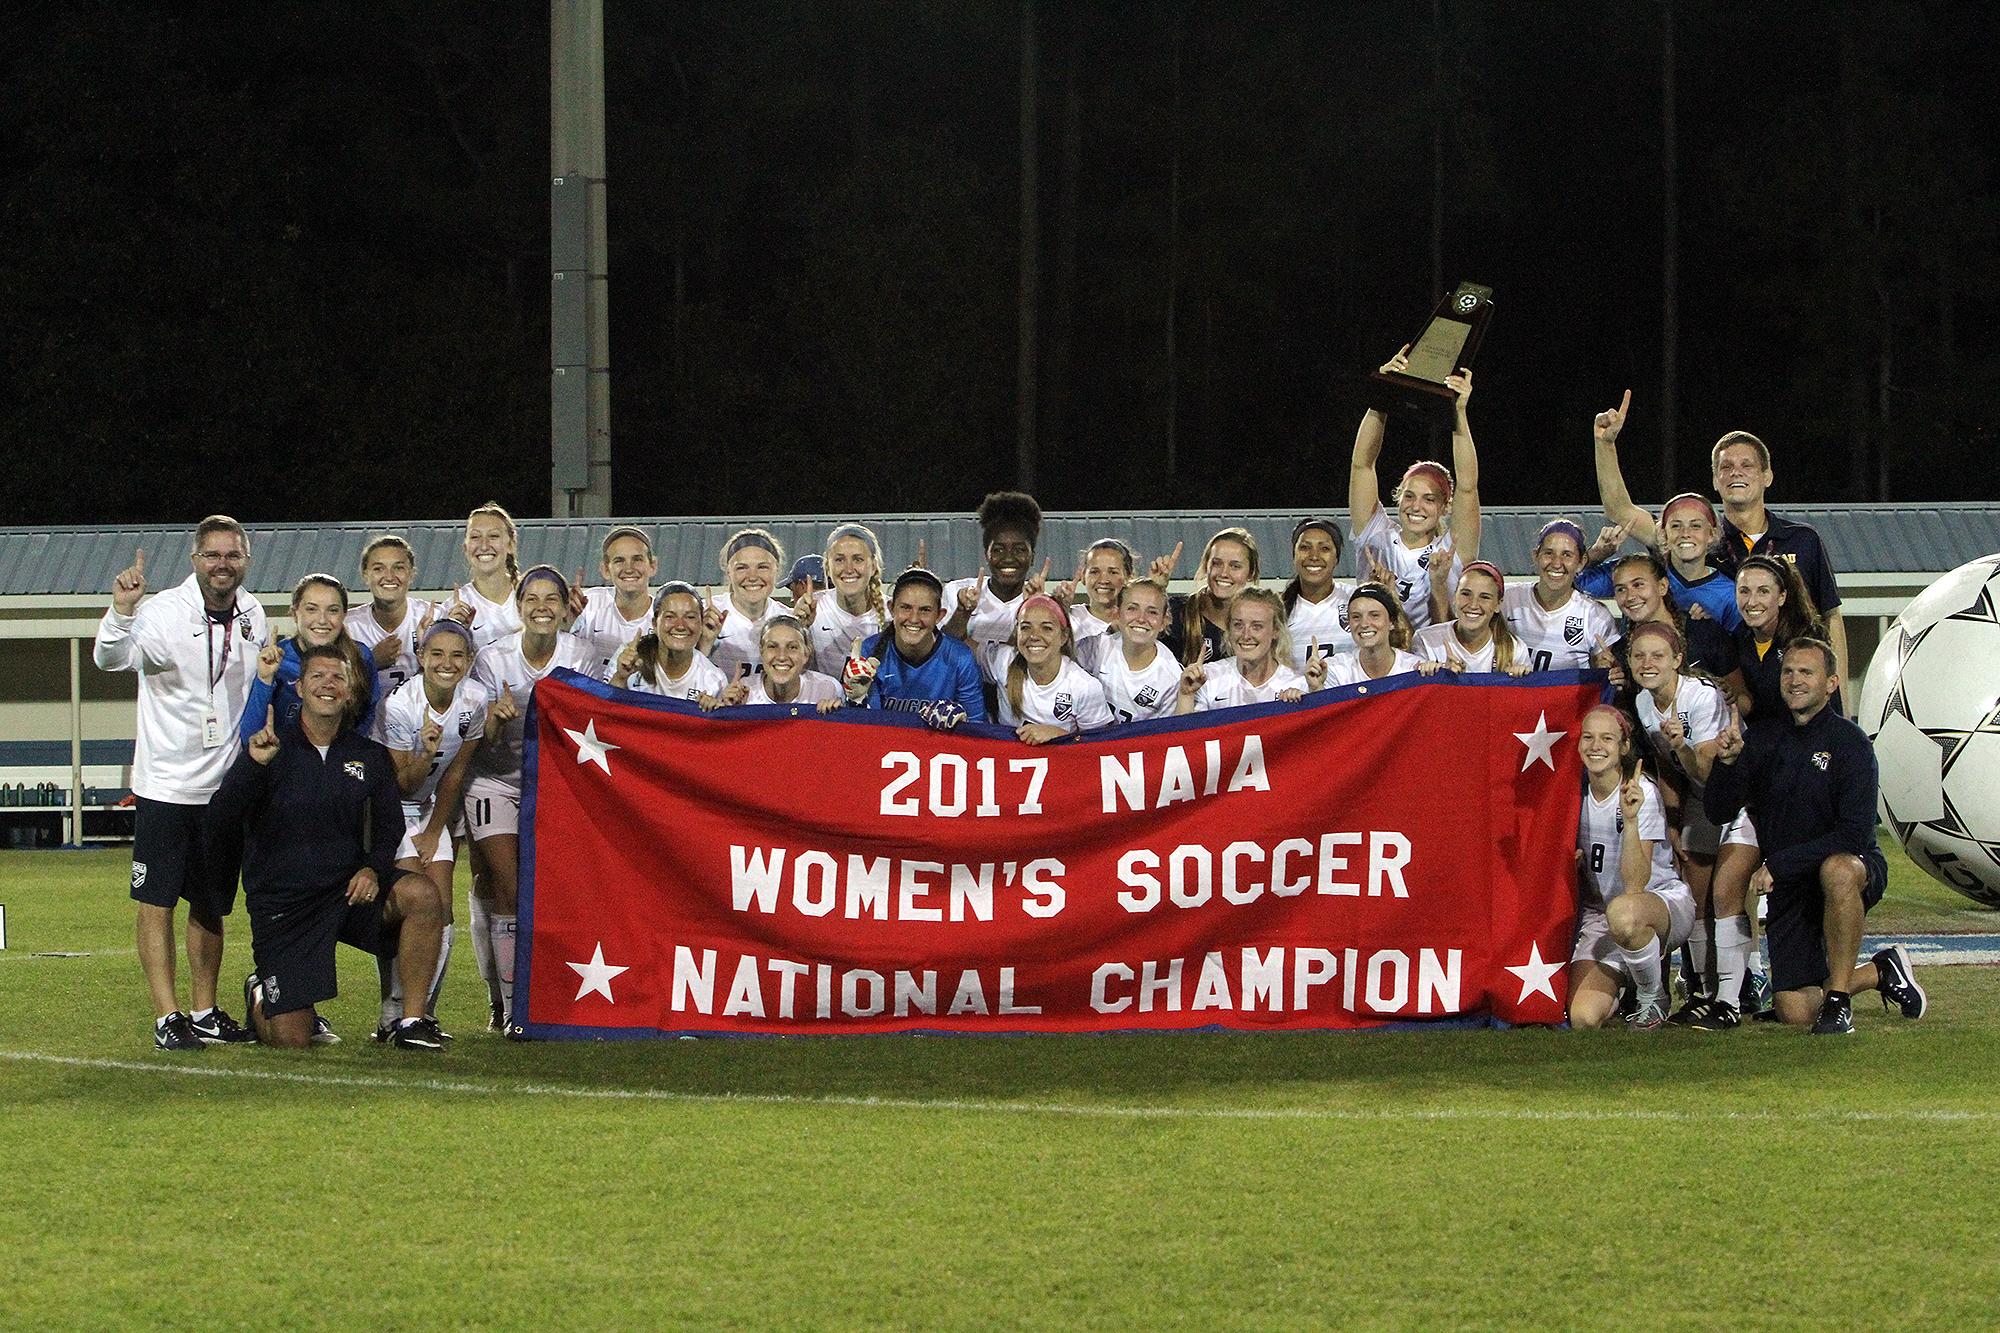 Spring Arbor Women's Soccer Wins 2017 NAIA National ...